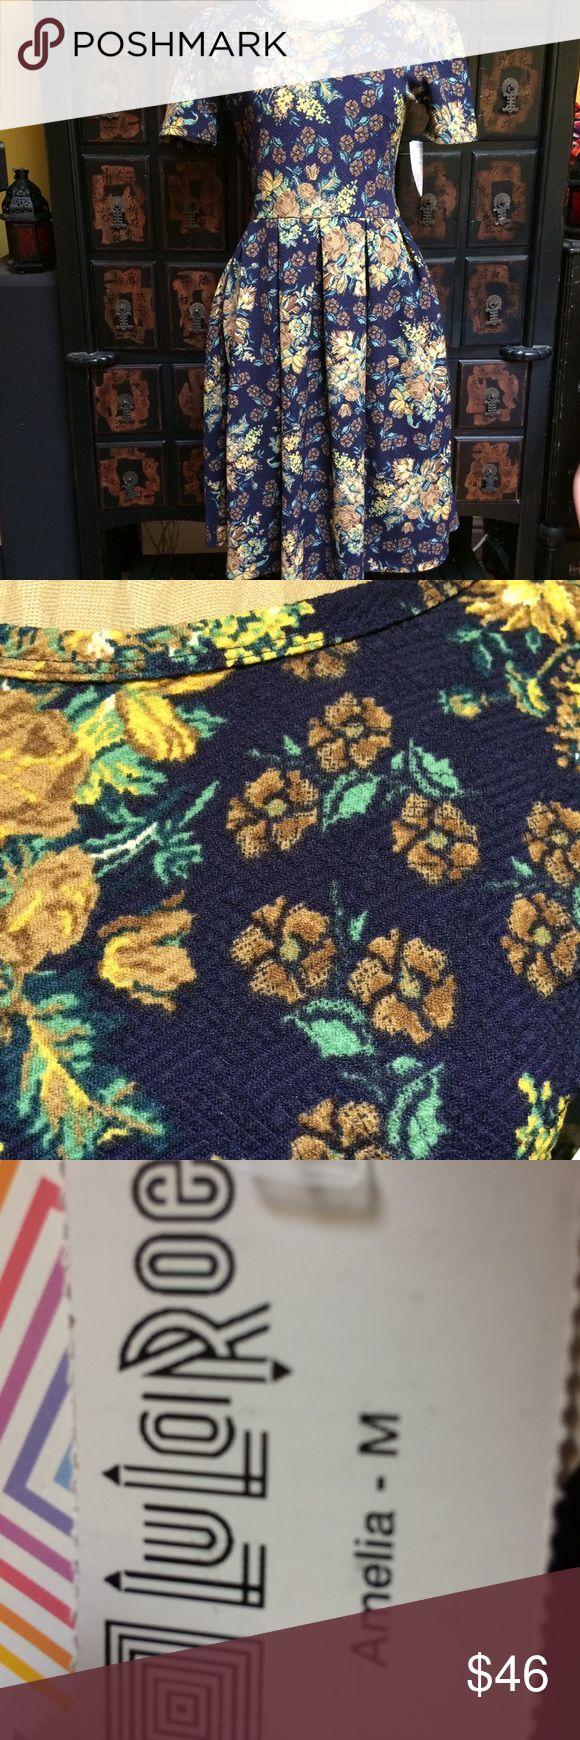 Very pretty floral Lularoe Amelia dress Pretty, pretty, pretty Lularoe Amelia dress LuLaRoe Dresses Midi